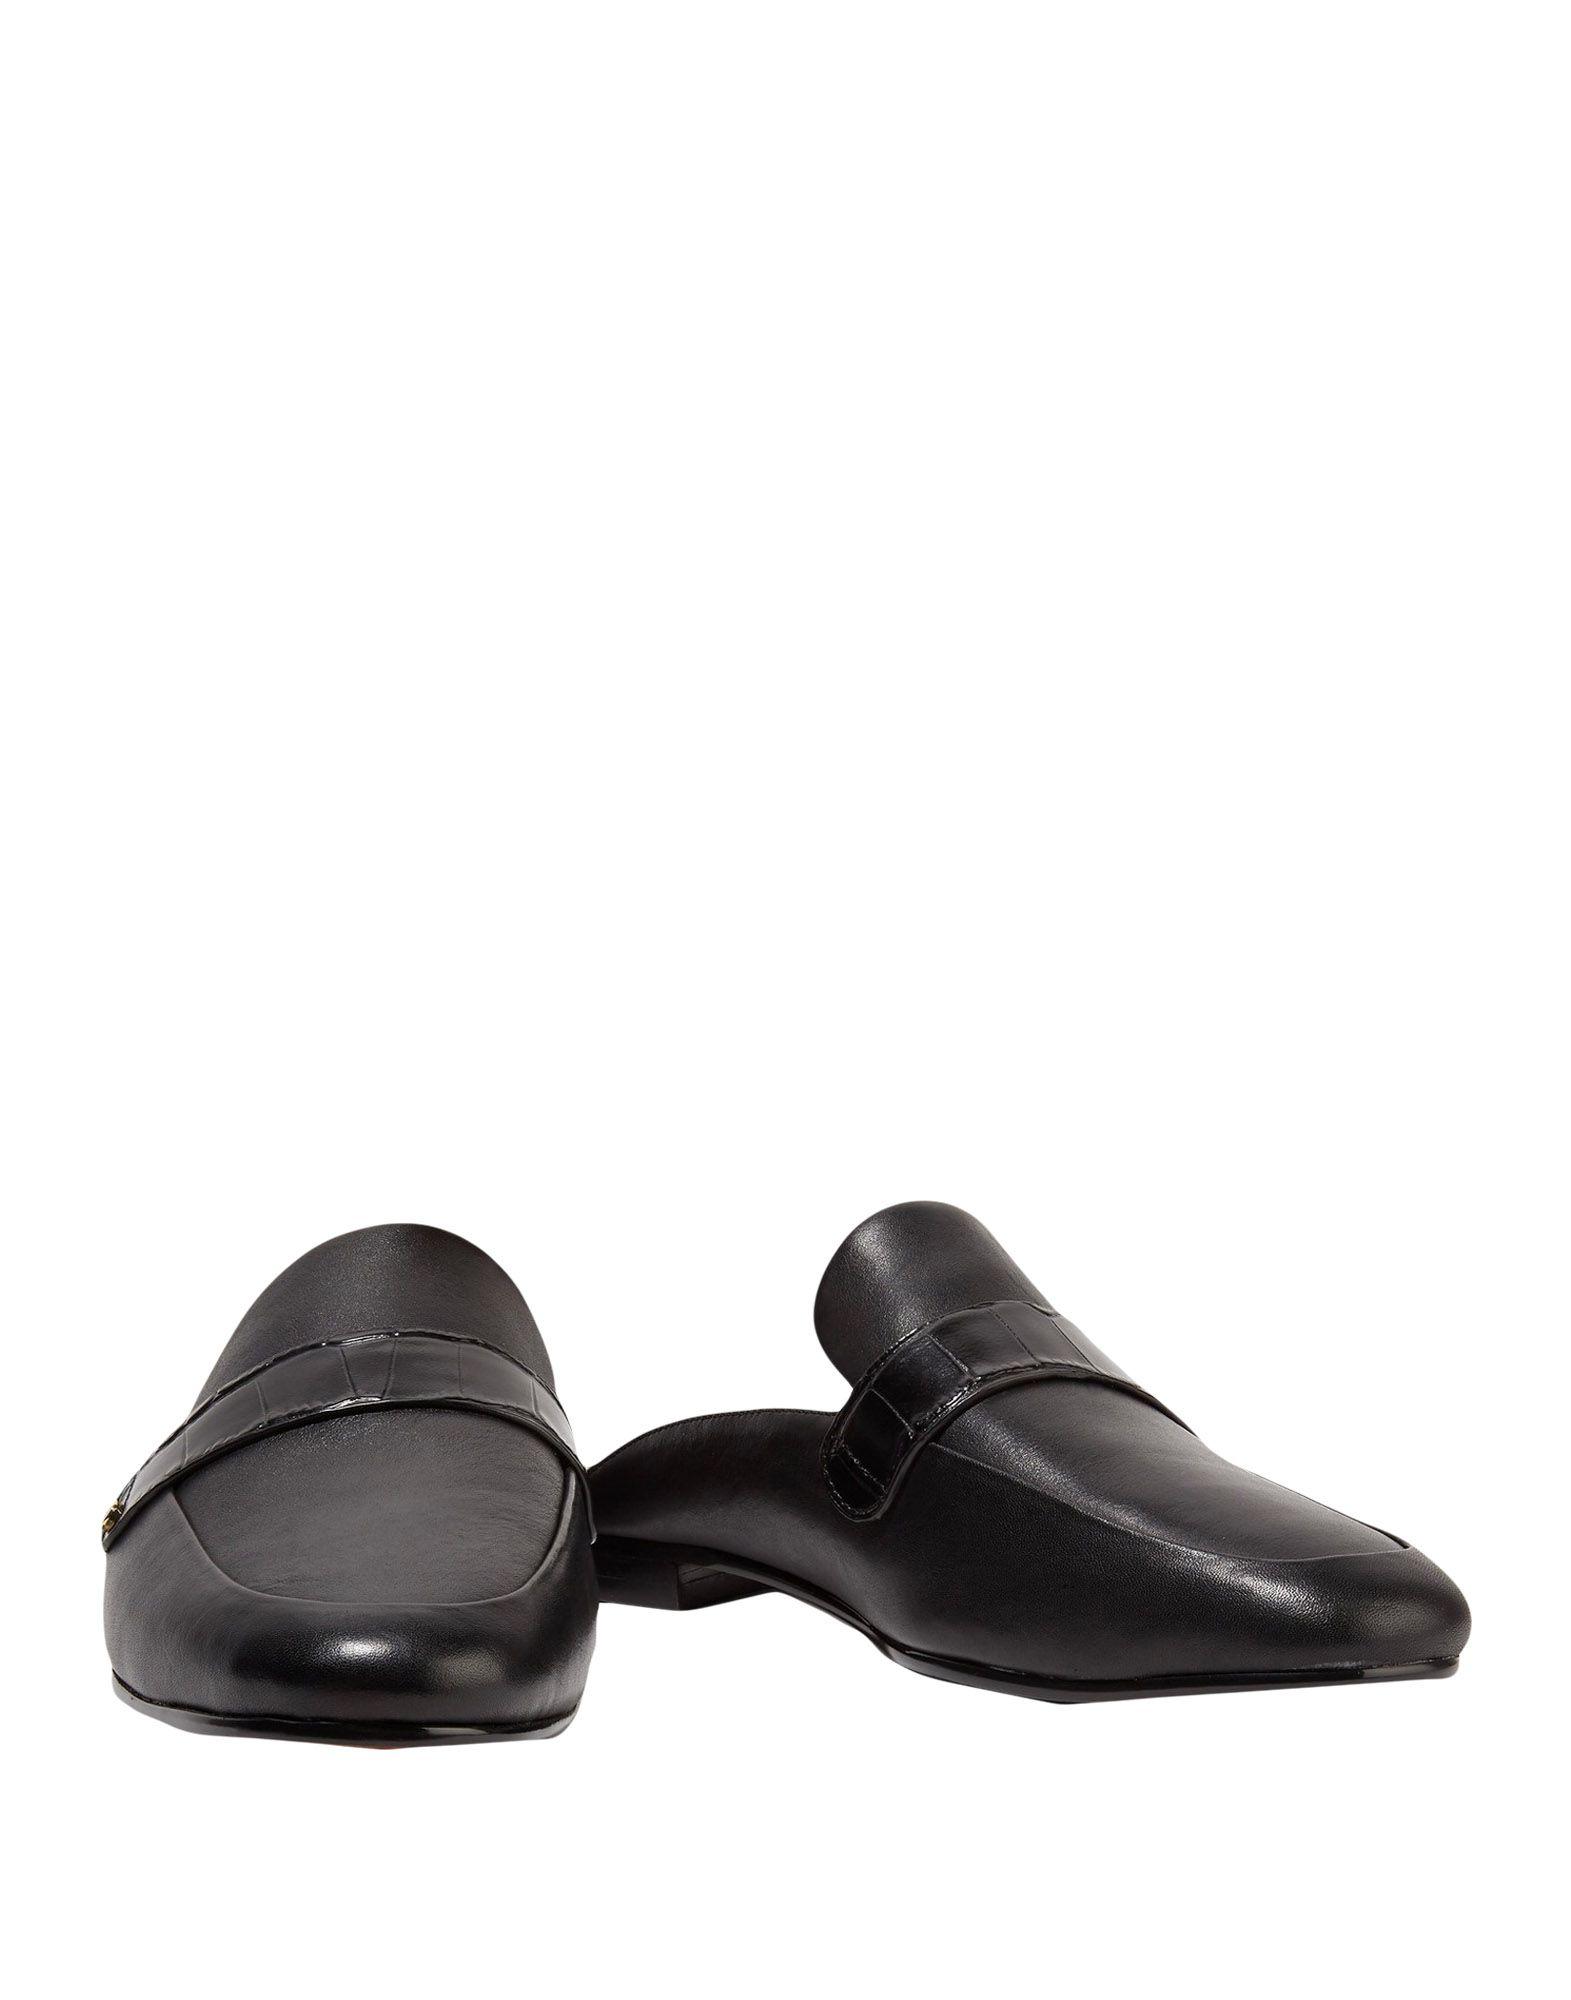 7b7e252c8c0e77 Sam Edelman Pantoletten Damen 11489697IN Gute Qualität beliebte Schuhe